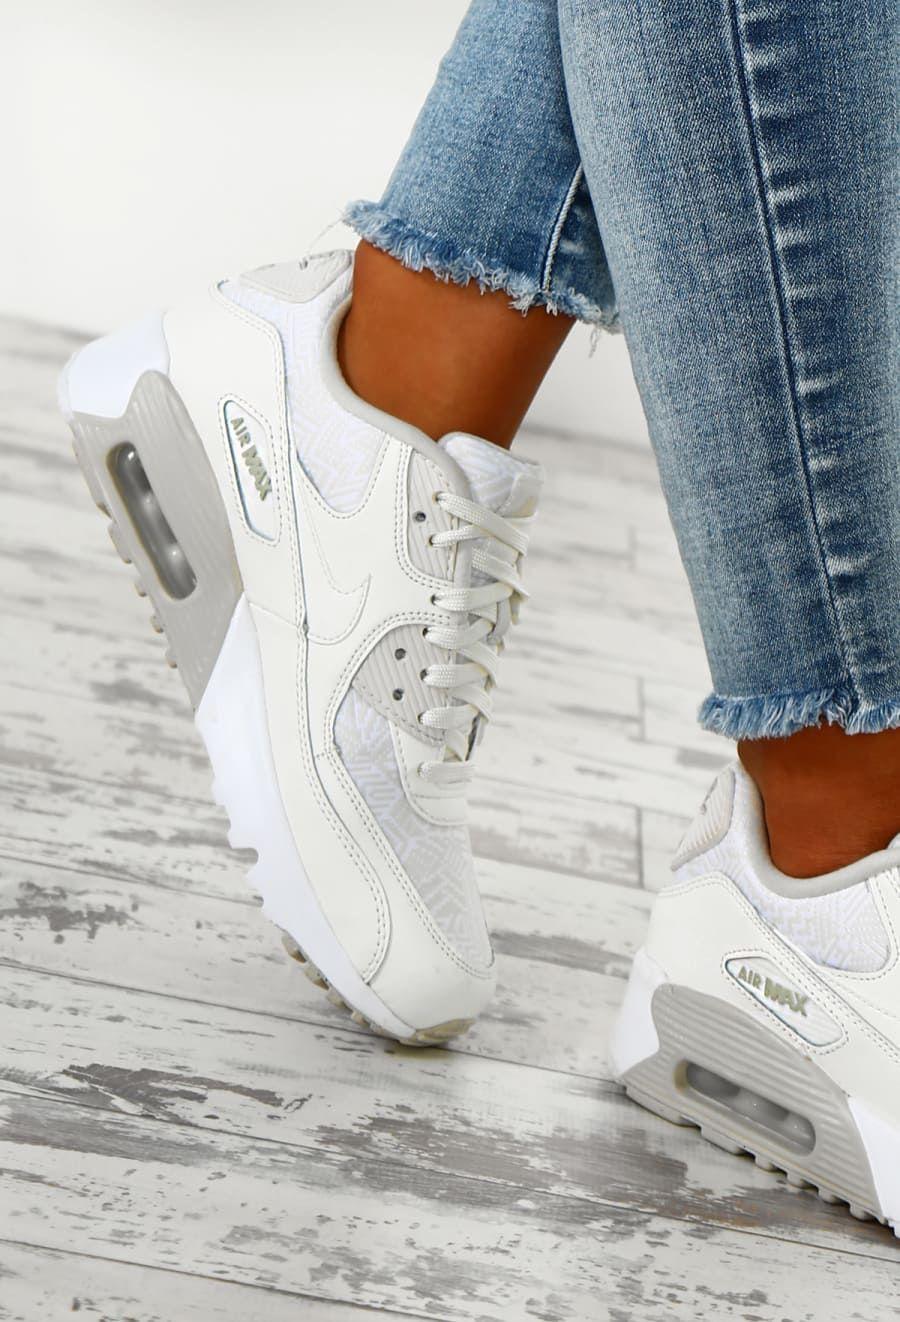 Nike Air Max 90 White Trainers Https Twitter Com Gmlinglin Status 978435341462904832 Nike Air Max 90 White Stylish Sneakers Sneakers Fashion